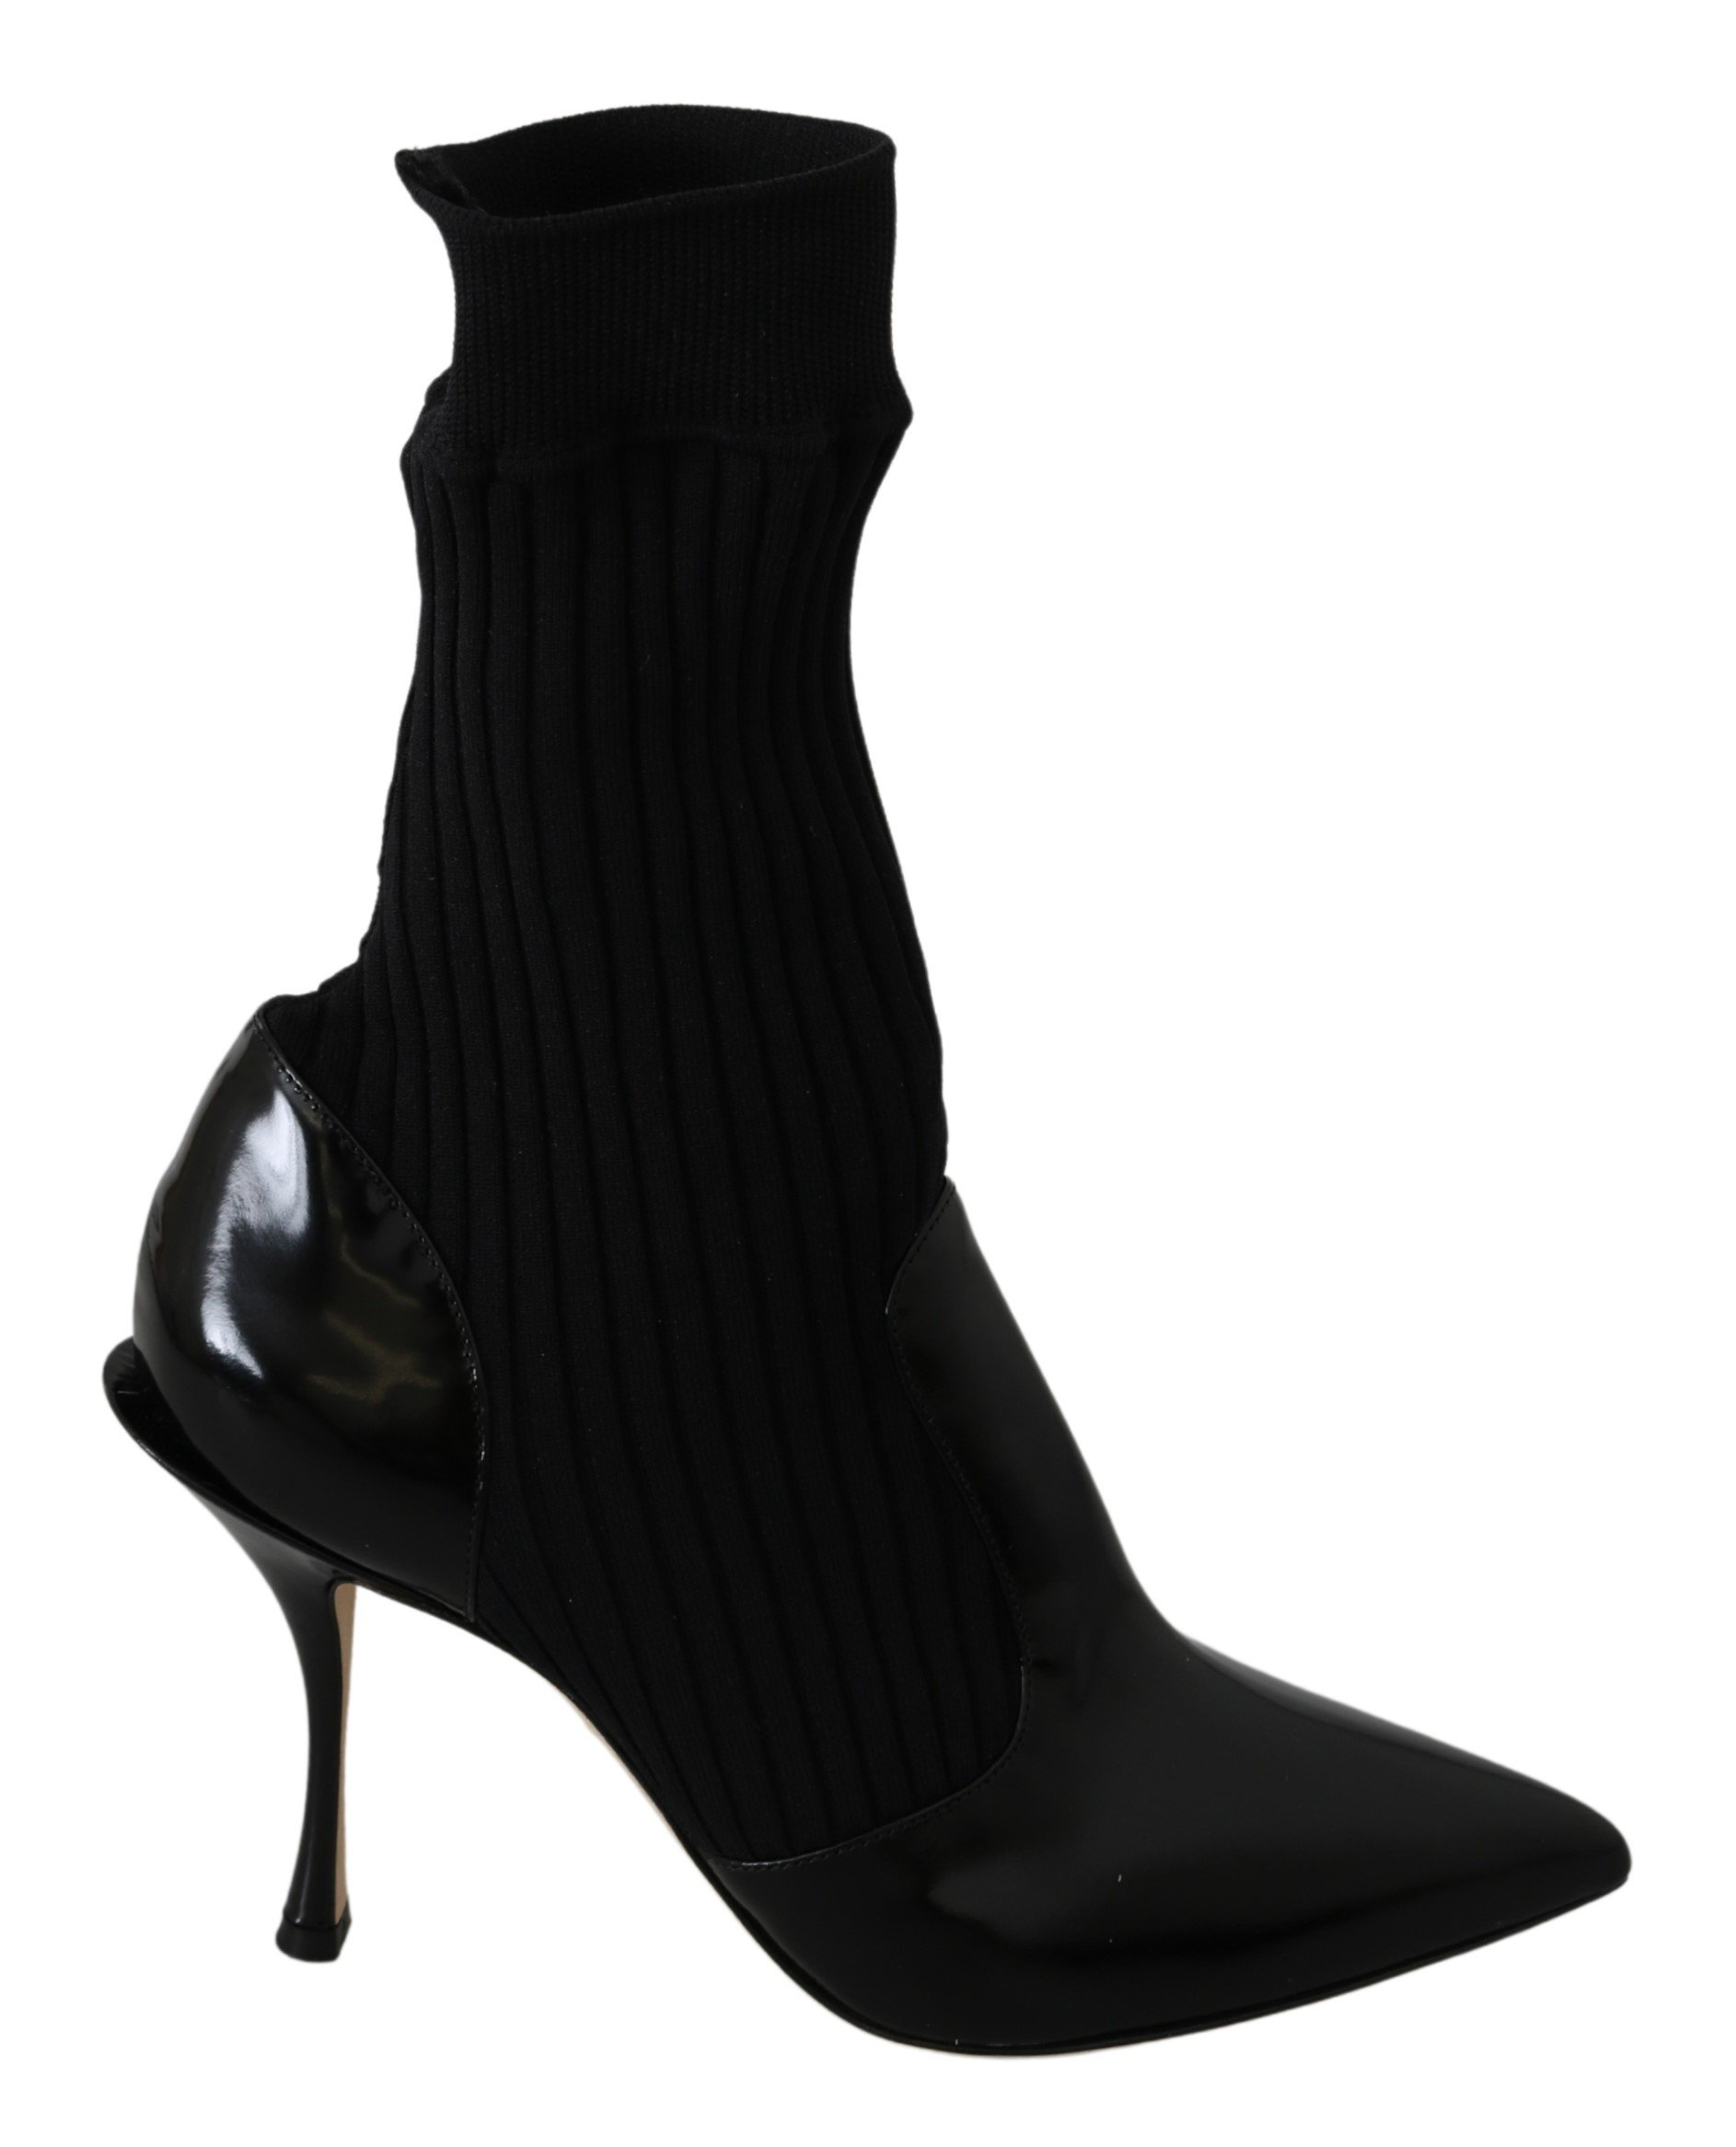 Black Mid Calf Socks Leather Boots Shoes - EU37/US6.5